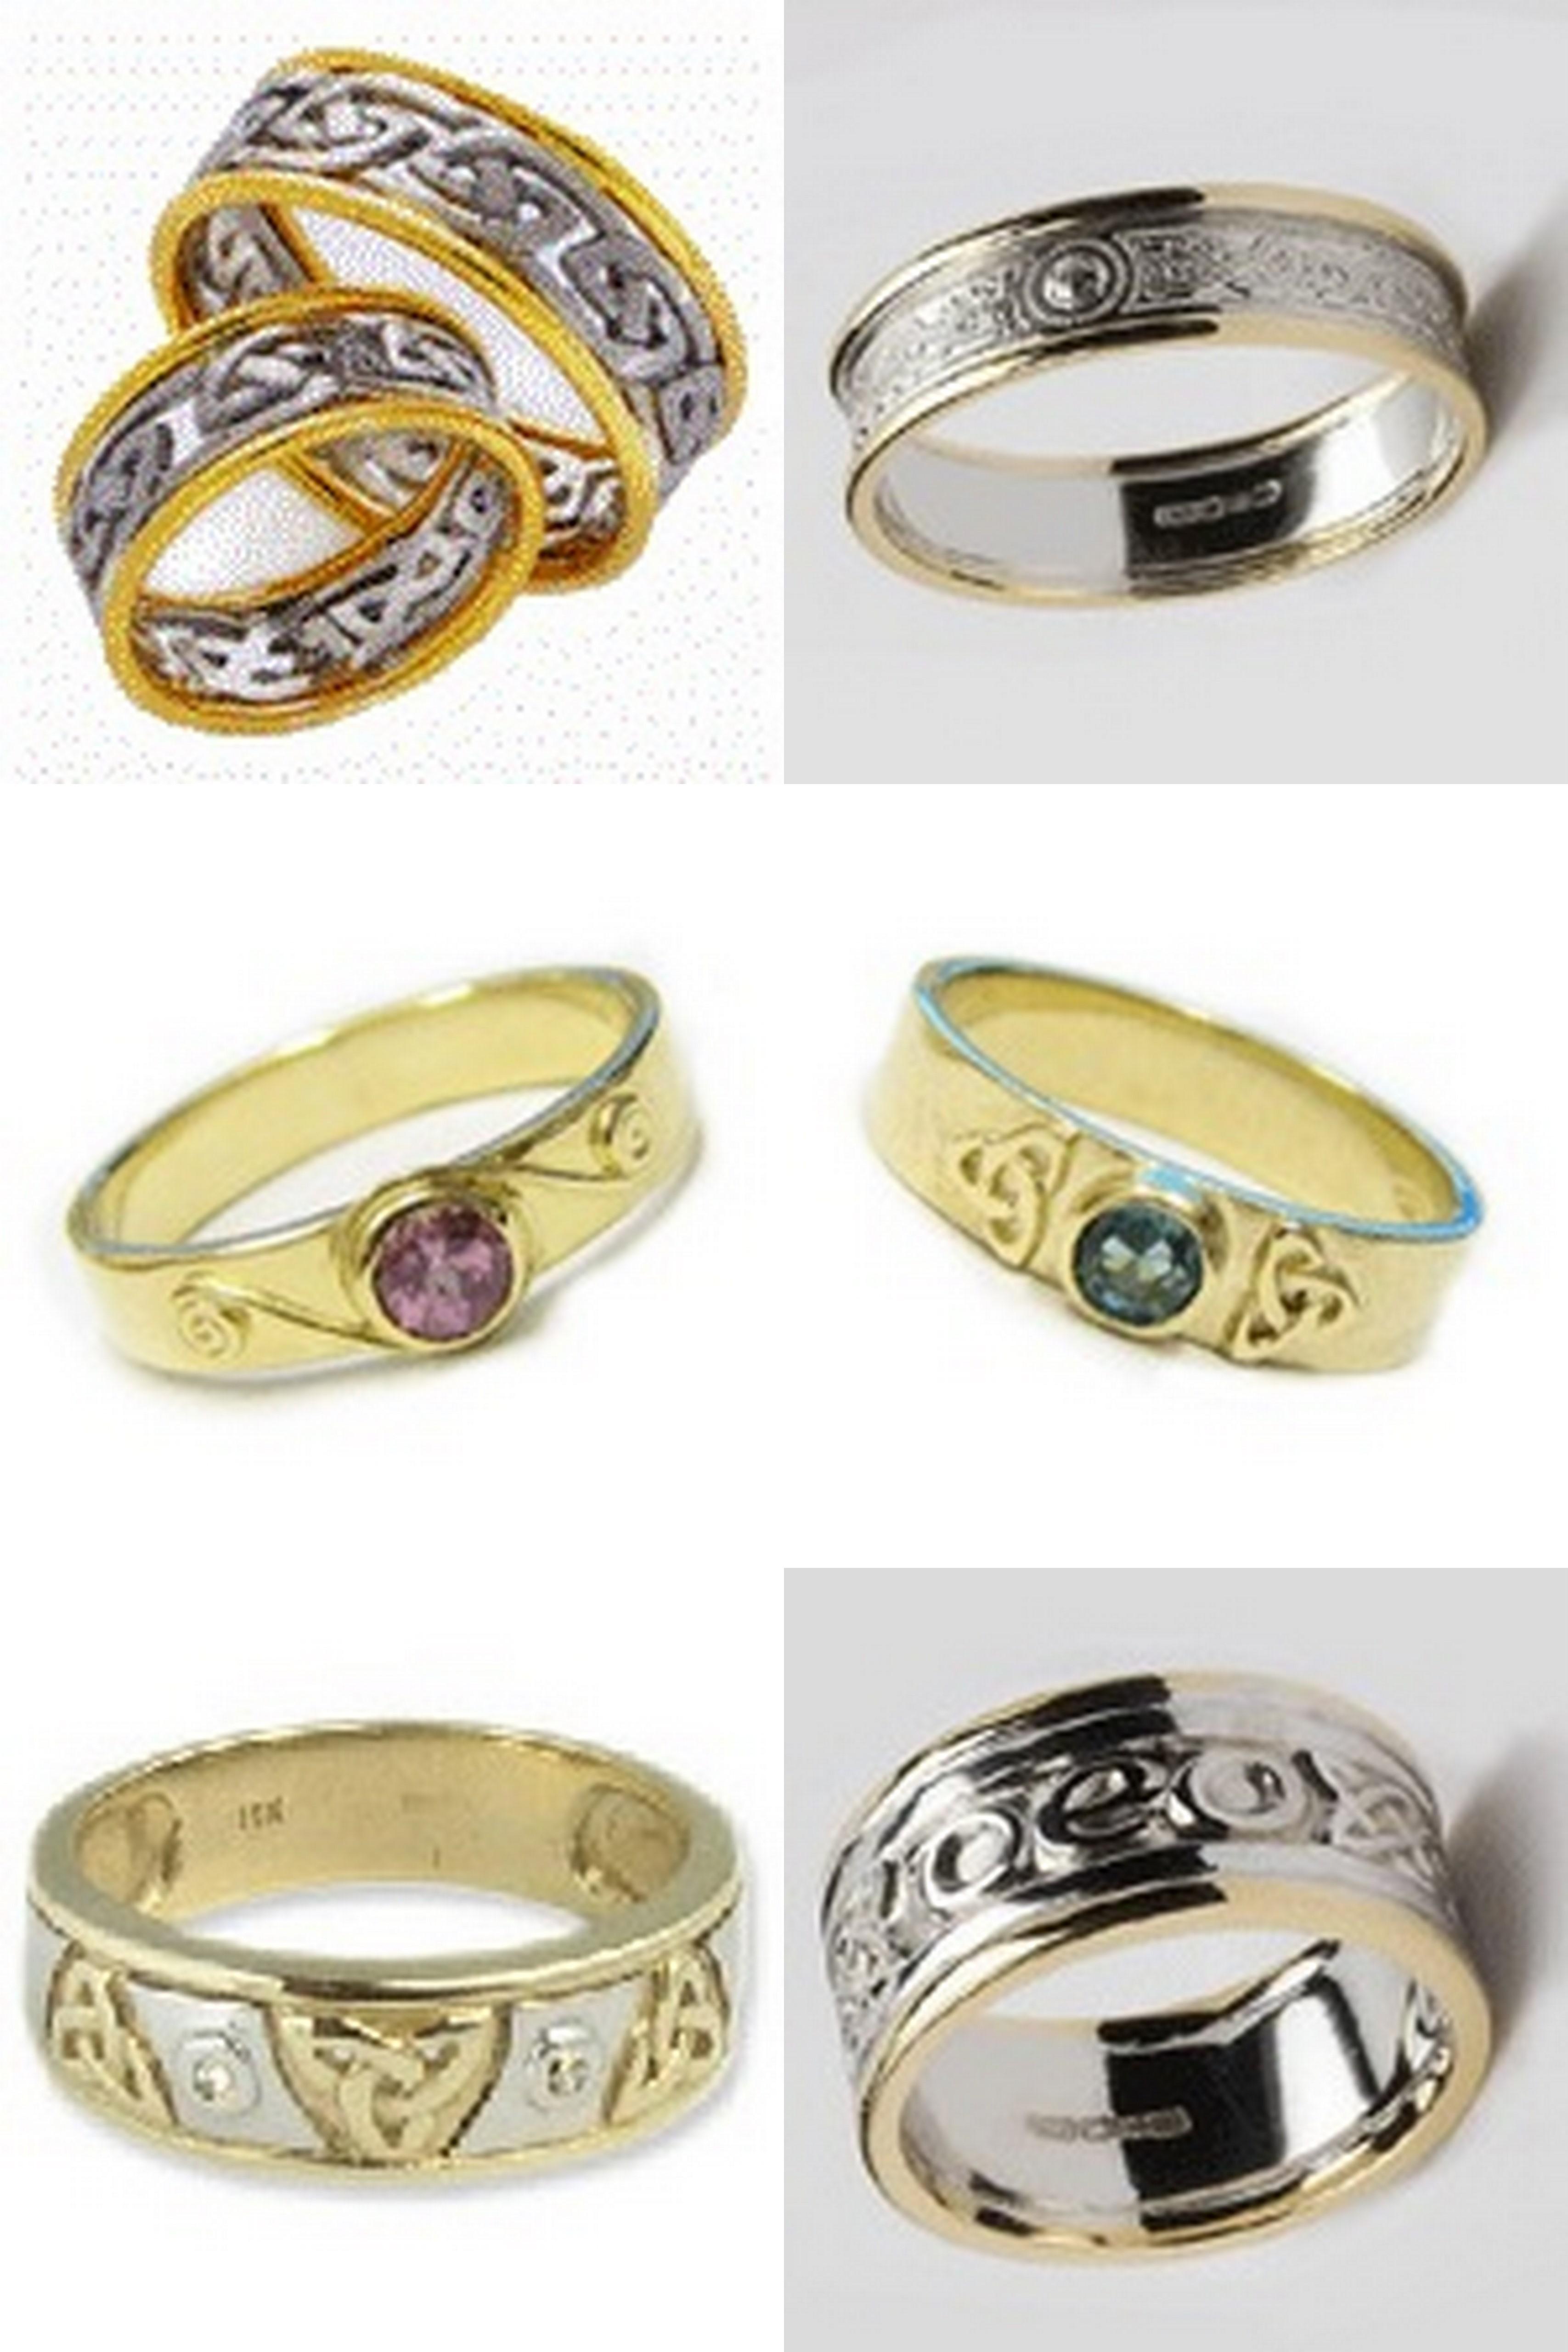 jewellery stores, jewellery online, jewellery fashion, indian jewellery designs, indian jewellery, jewellery definition, jewellery making, jewellery exchange-122